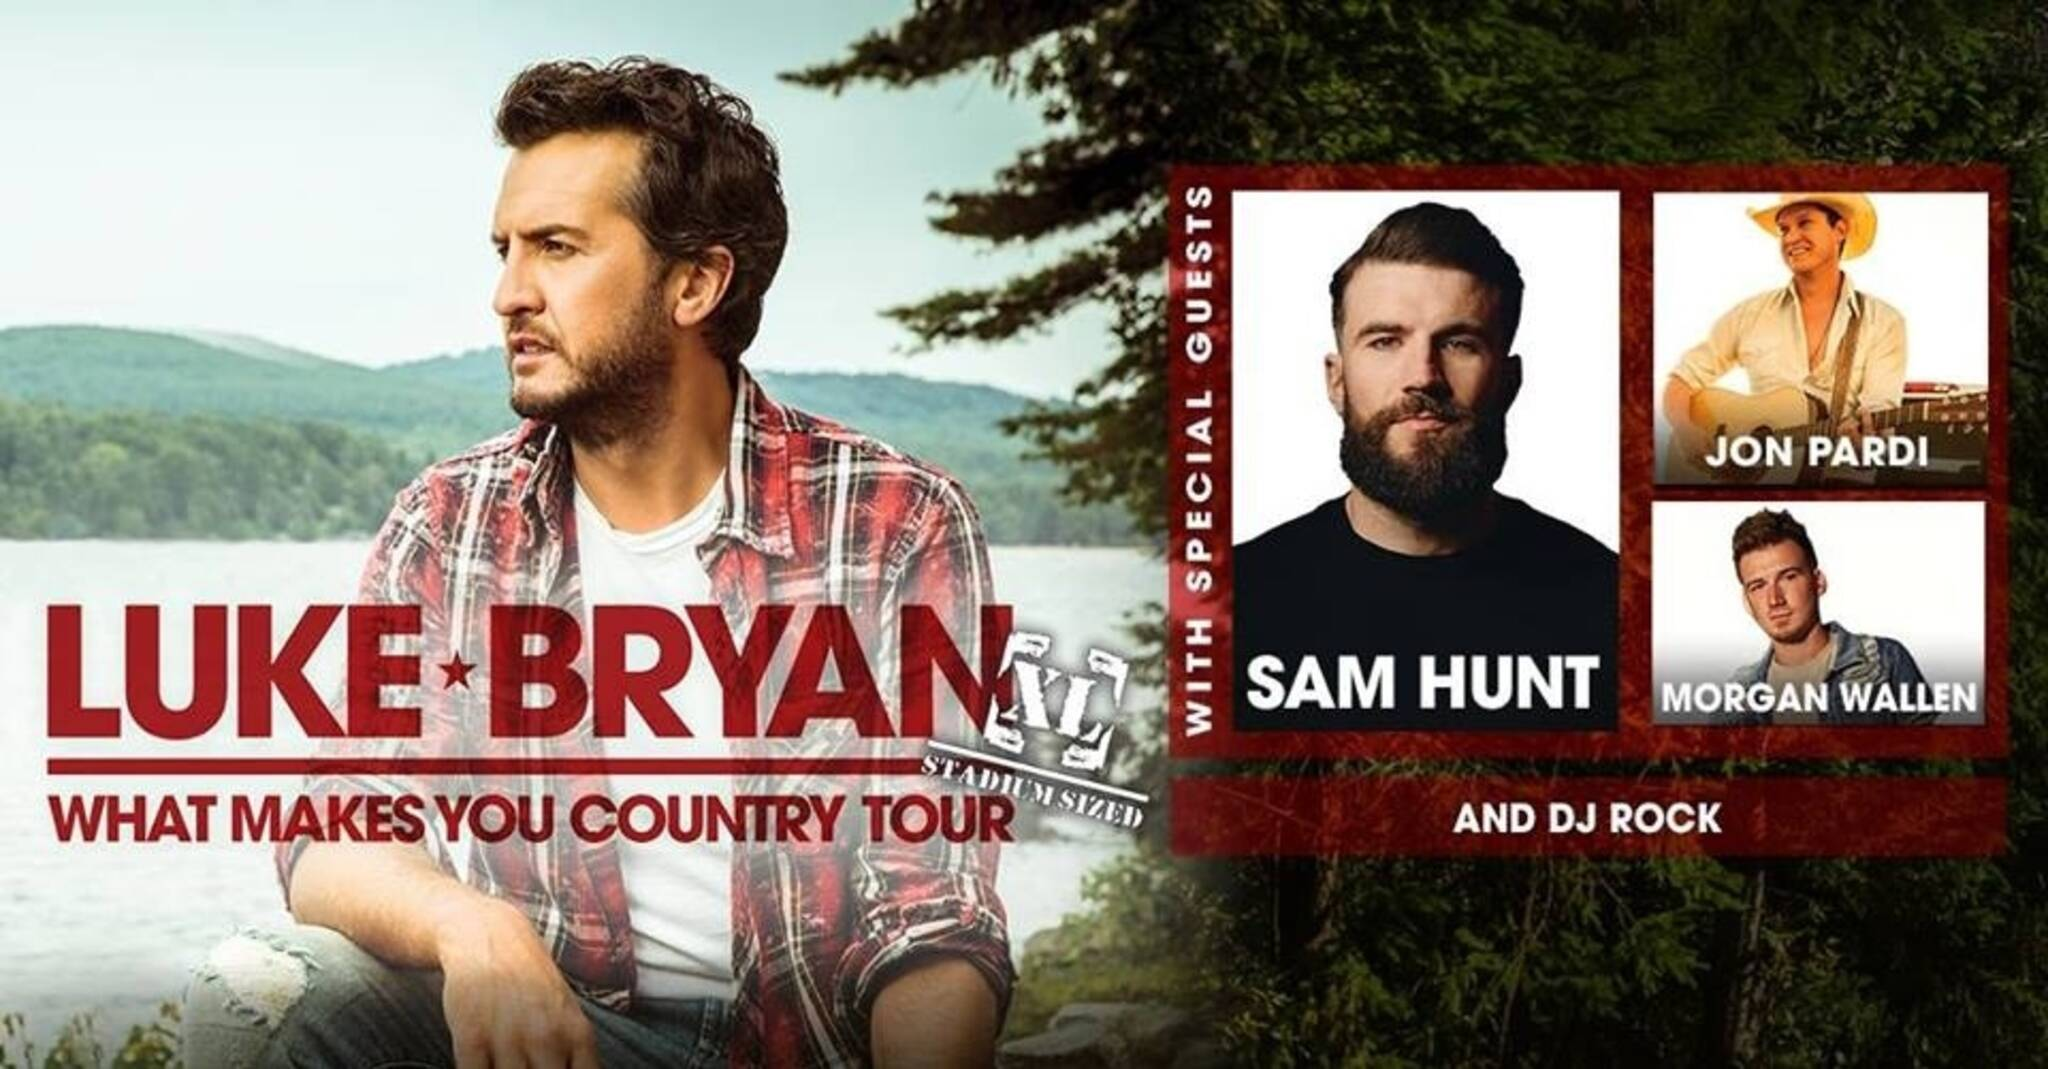 Luke Bryan and Sam Hunt Toronto concert at Rogers Centre